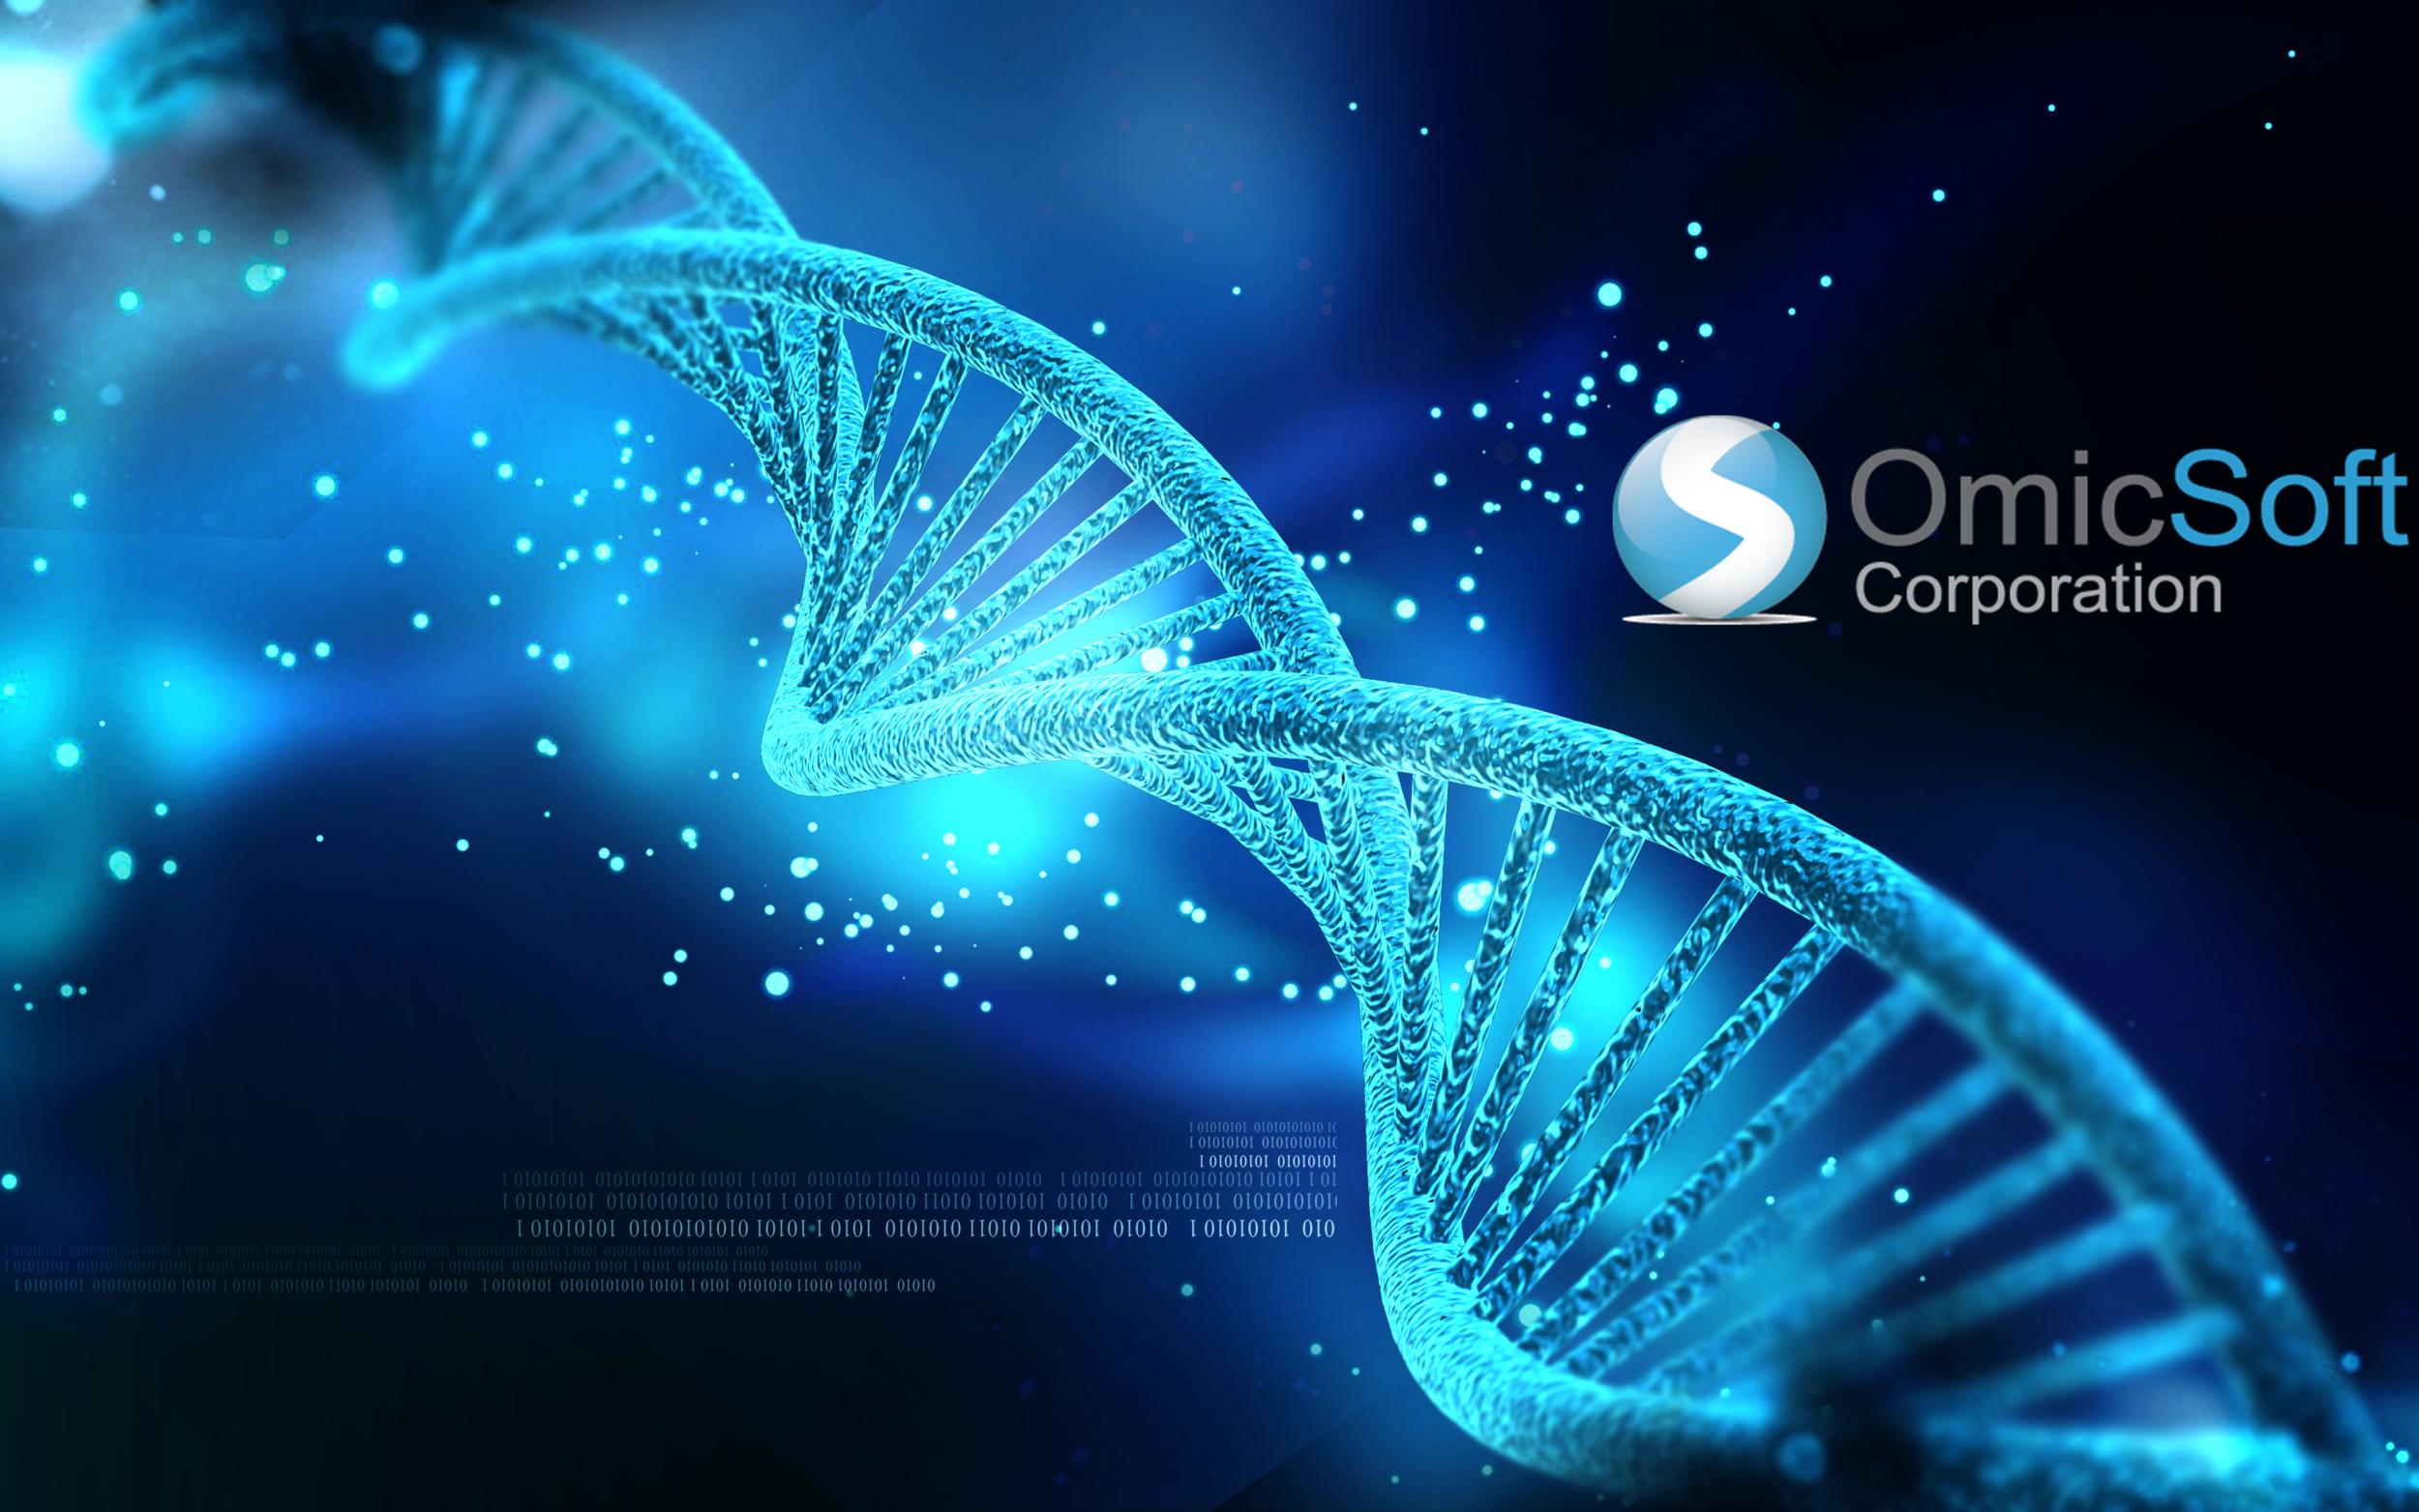 Omicsoft Squarespace Thumbnail Image.png